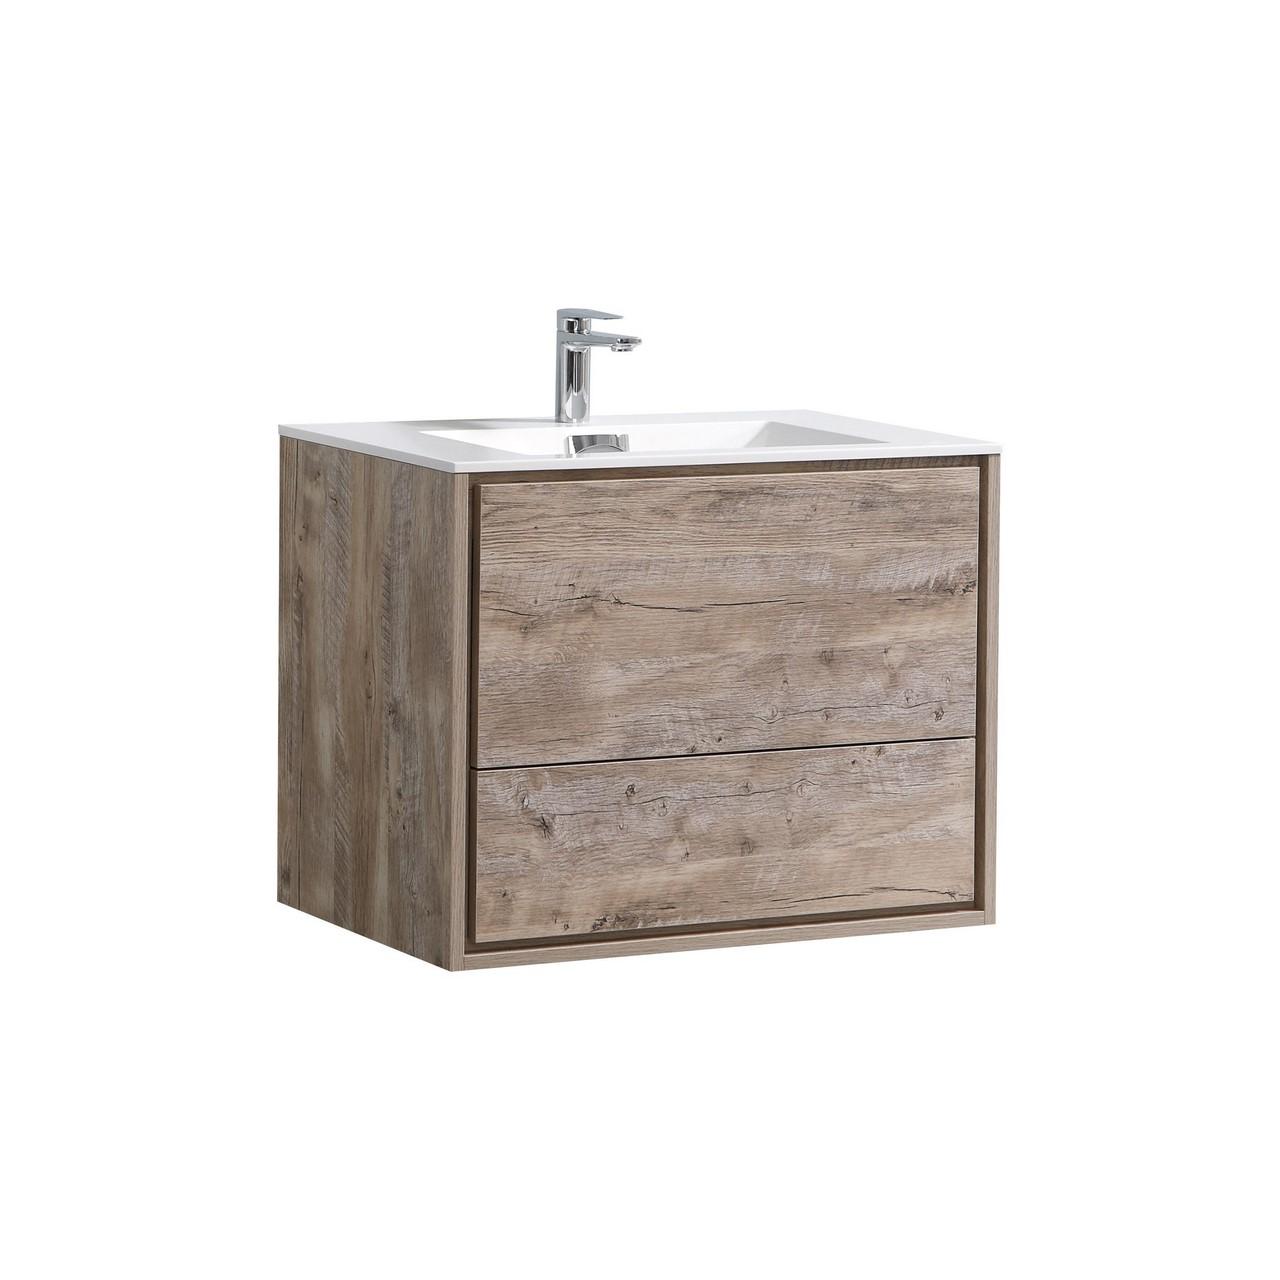 "de lusso 30"" nature wood wall mount modern bathroom vanity"